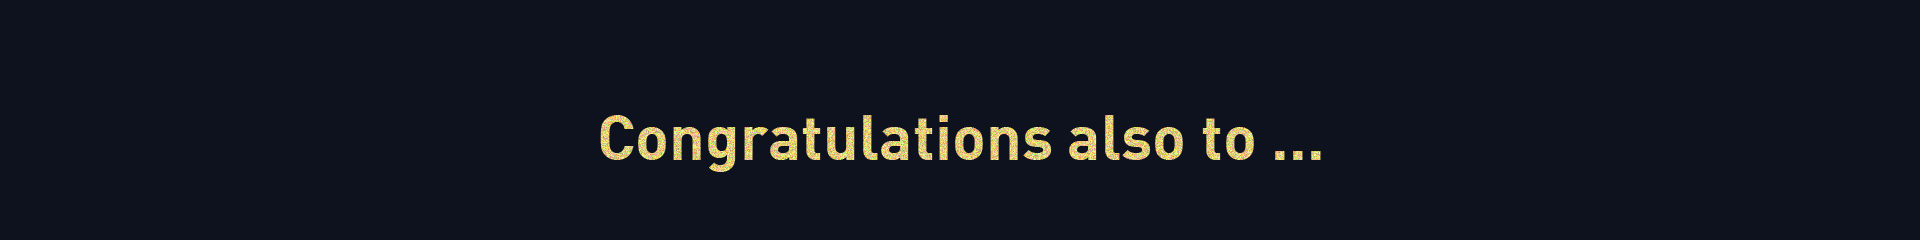 Congratulations also to ...